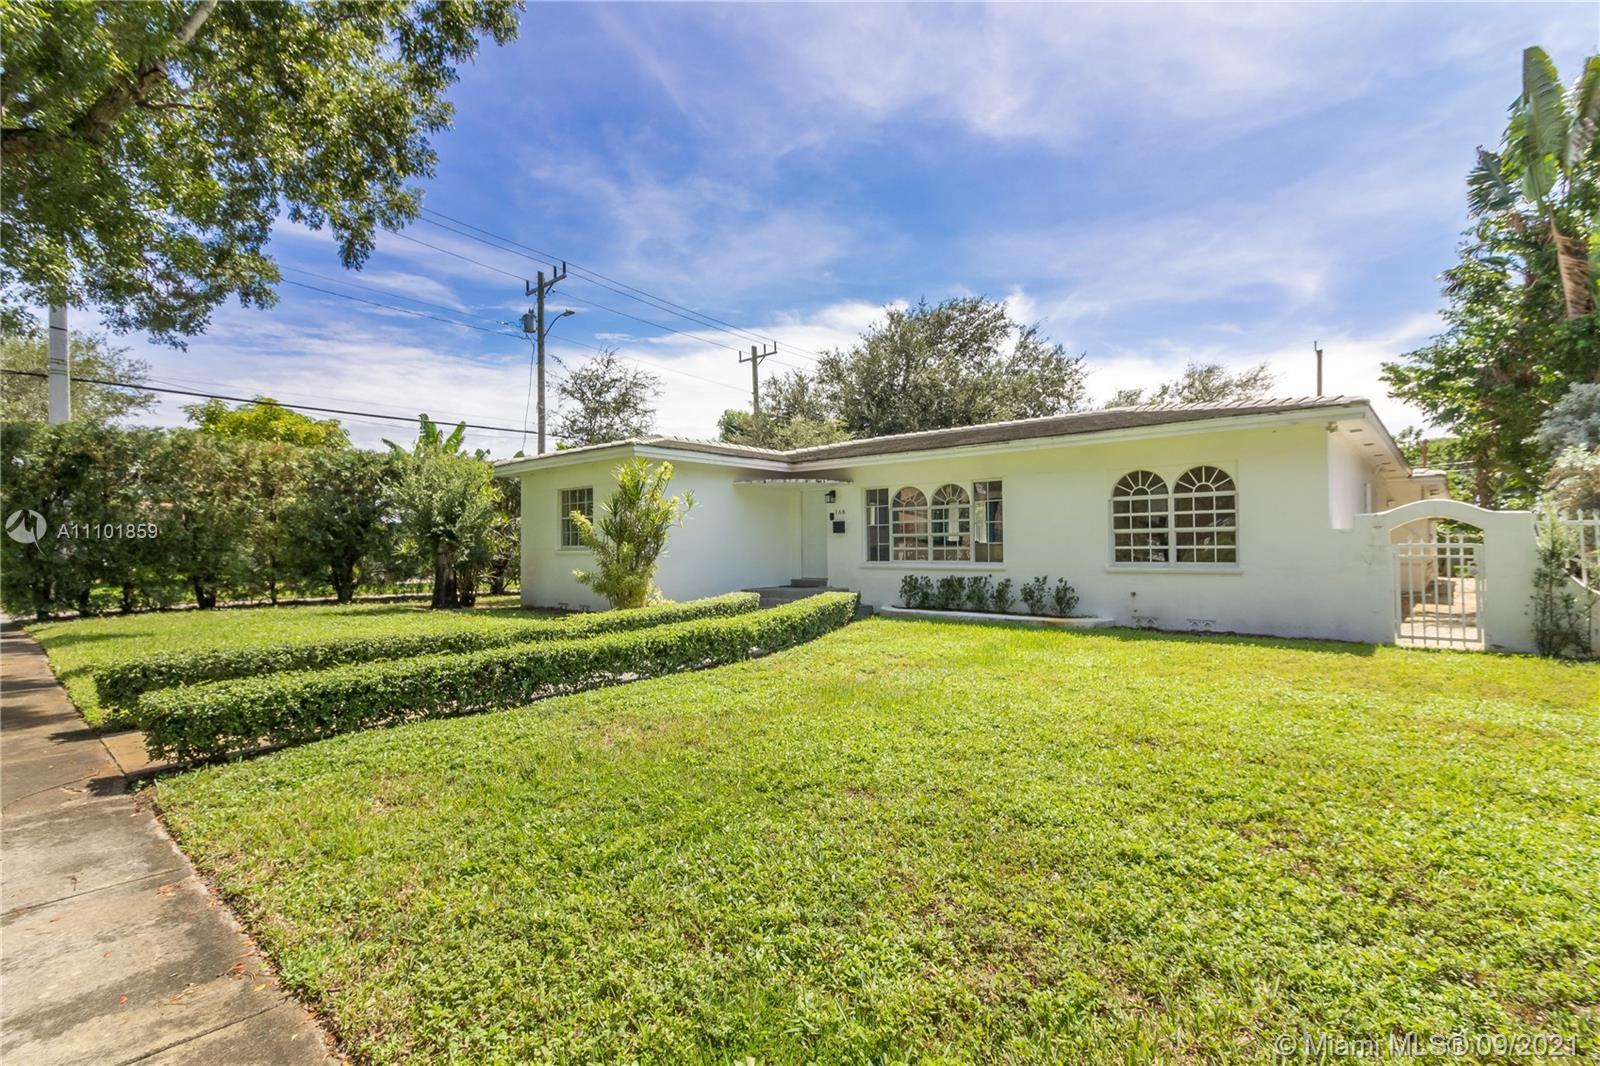 Single Family Home,For Rent,168 NE 91st St, Miami Shores, Florida 33138,Brickell,realty,broker,condos near me